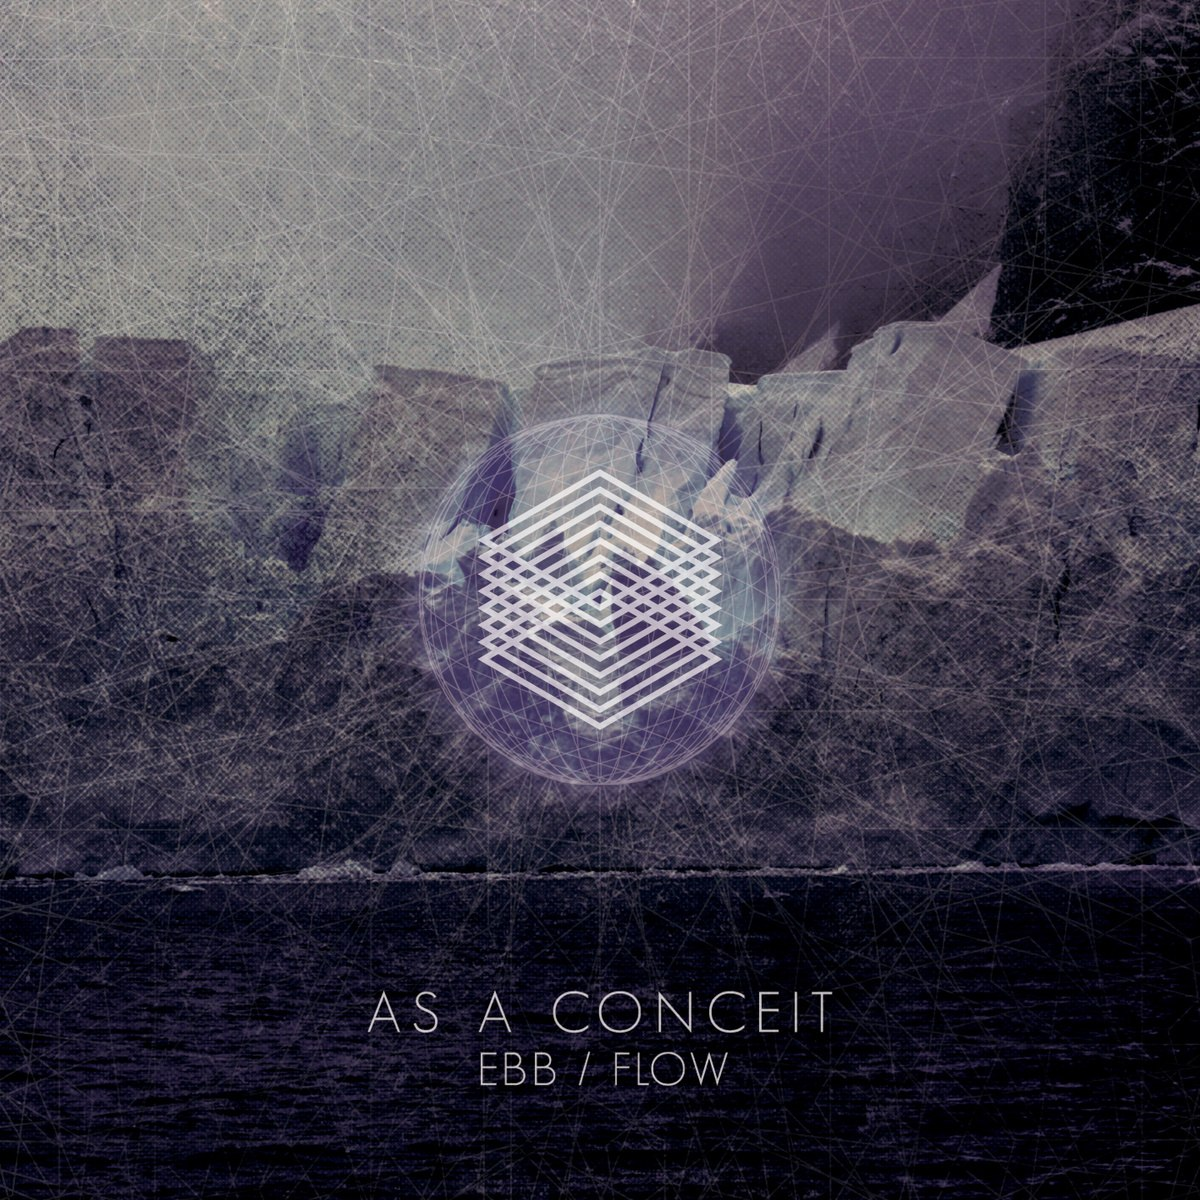 As A Conceit - Ebb / Flow [EP] (2014)